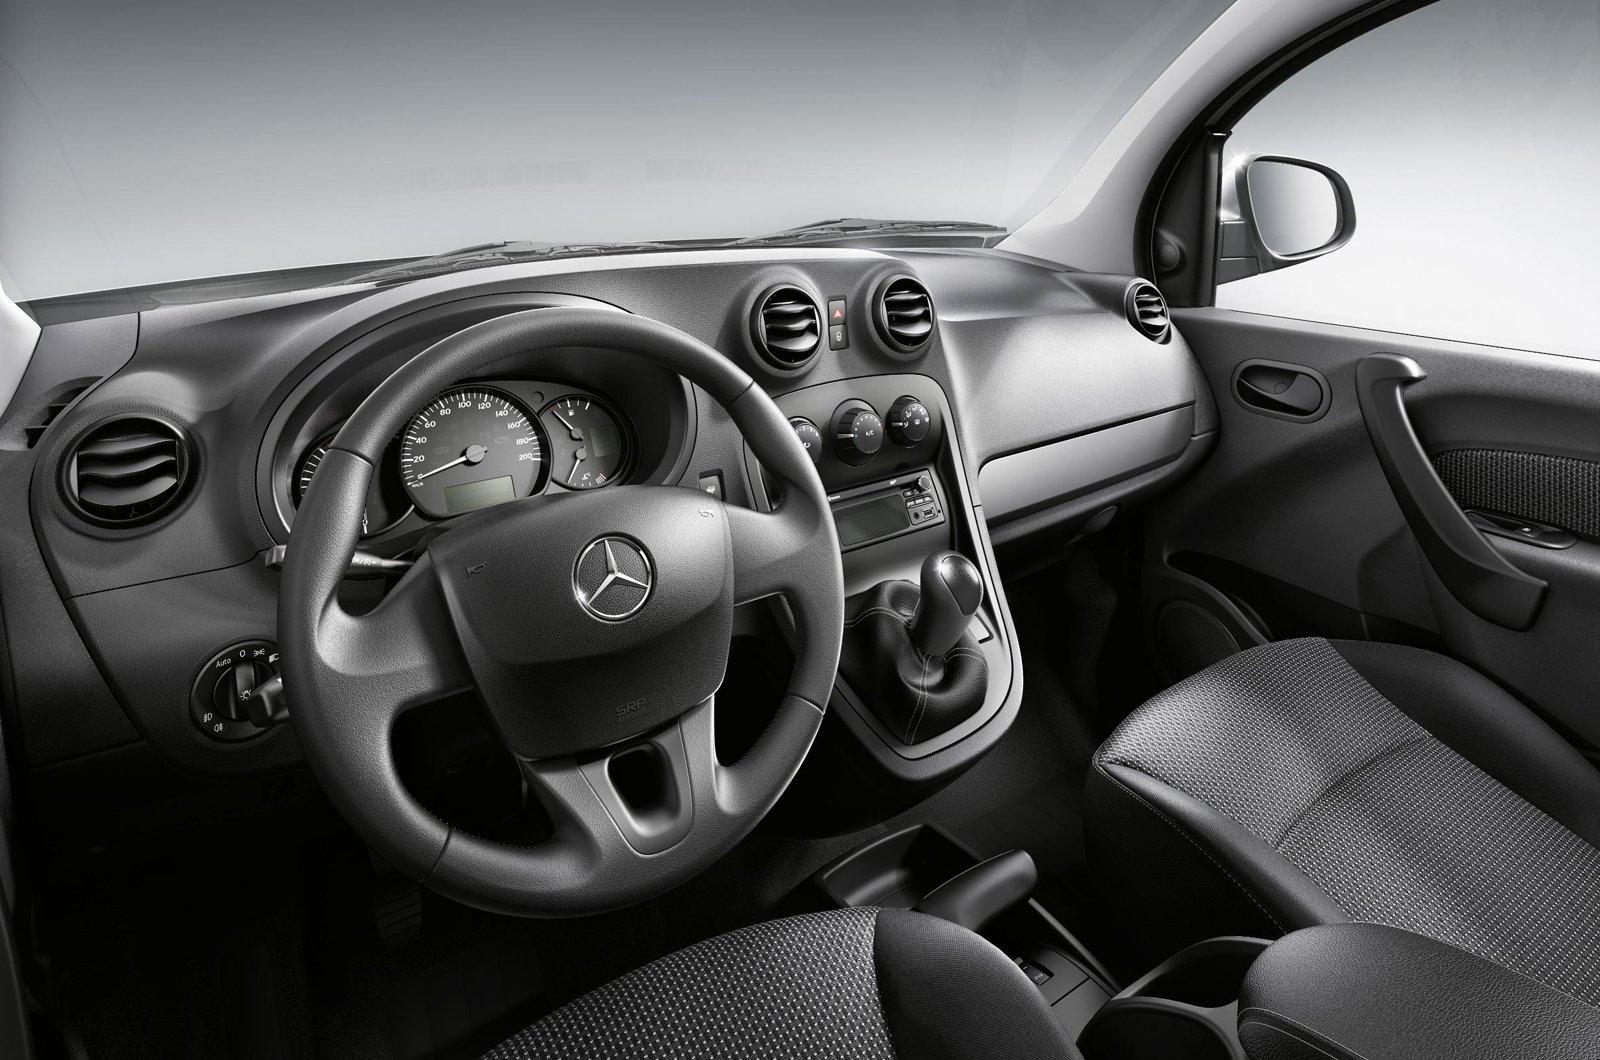 Mercedes Citan dashboard